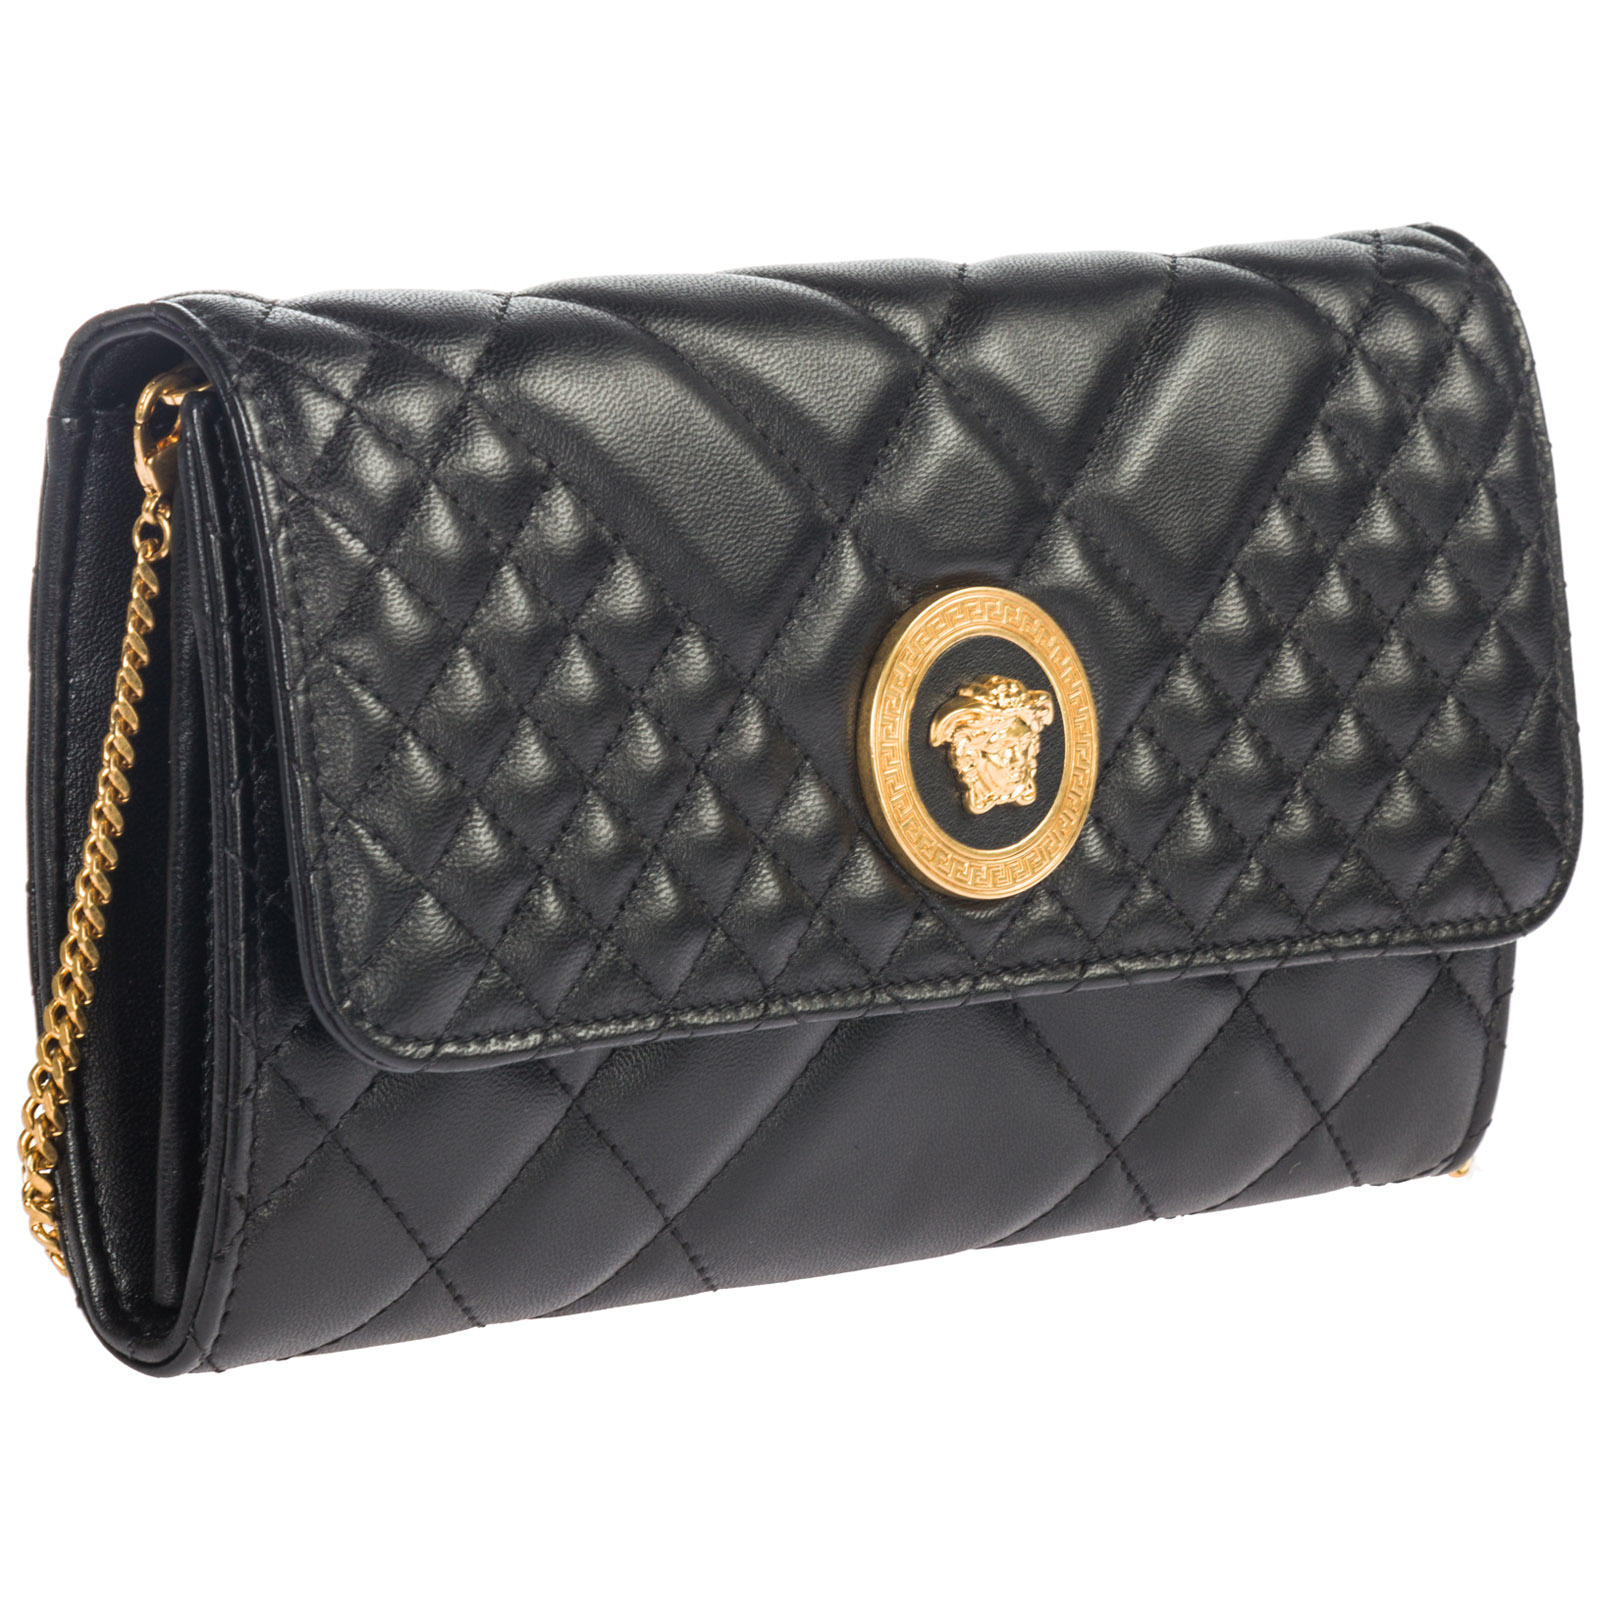 d5328537e8 Women's leather cross-body messenger shoulder bag